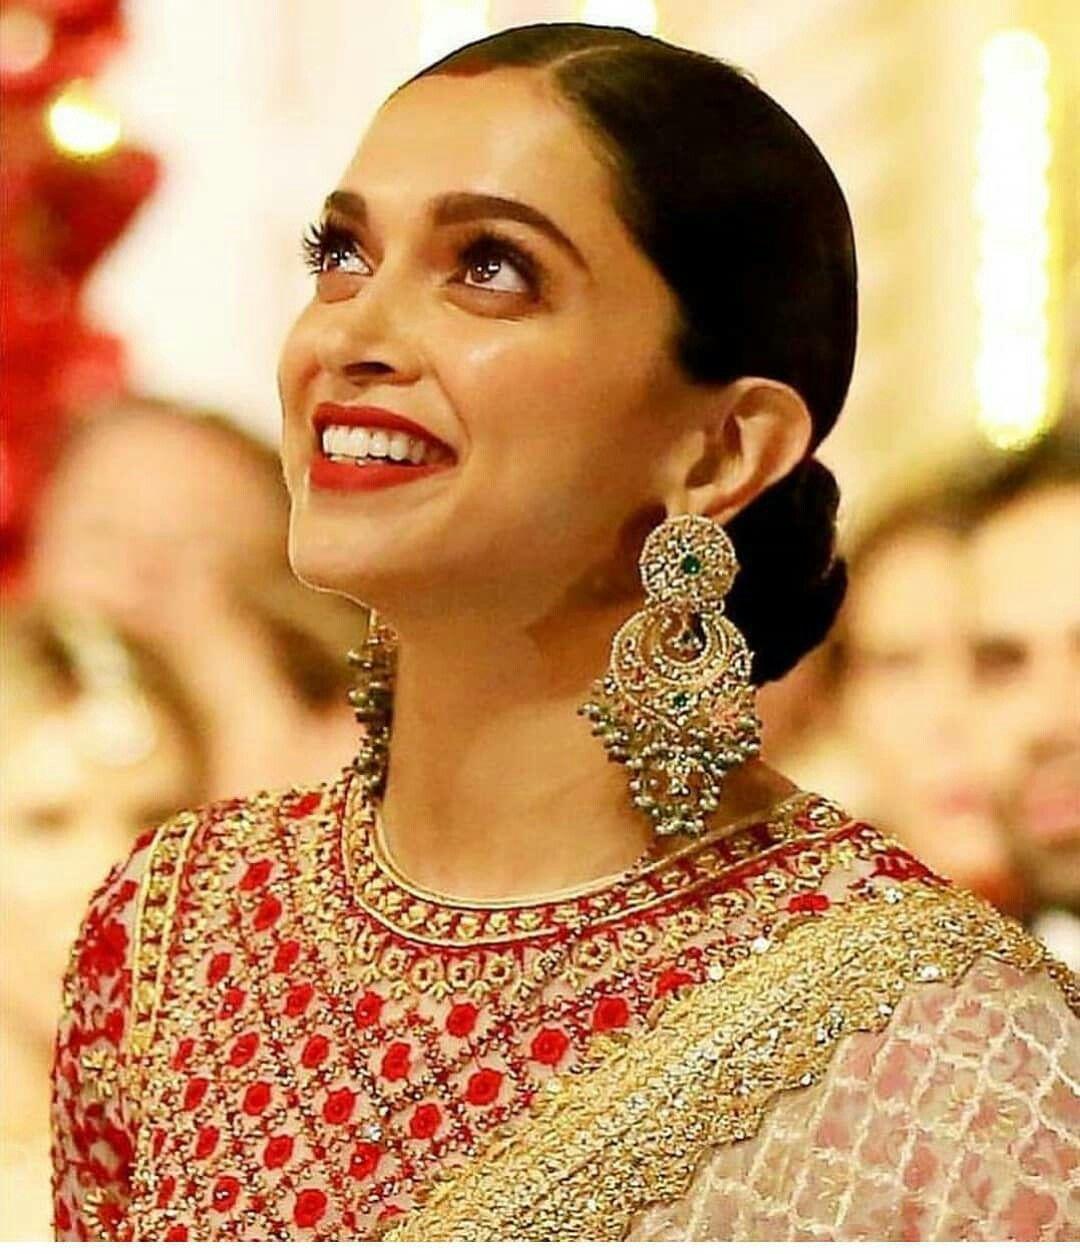 Pin by Jayakrithika on Krithika | Big earrings, Deepika padukone style, Deepika padukone